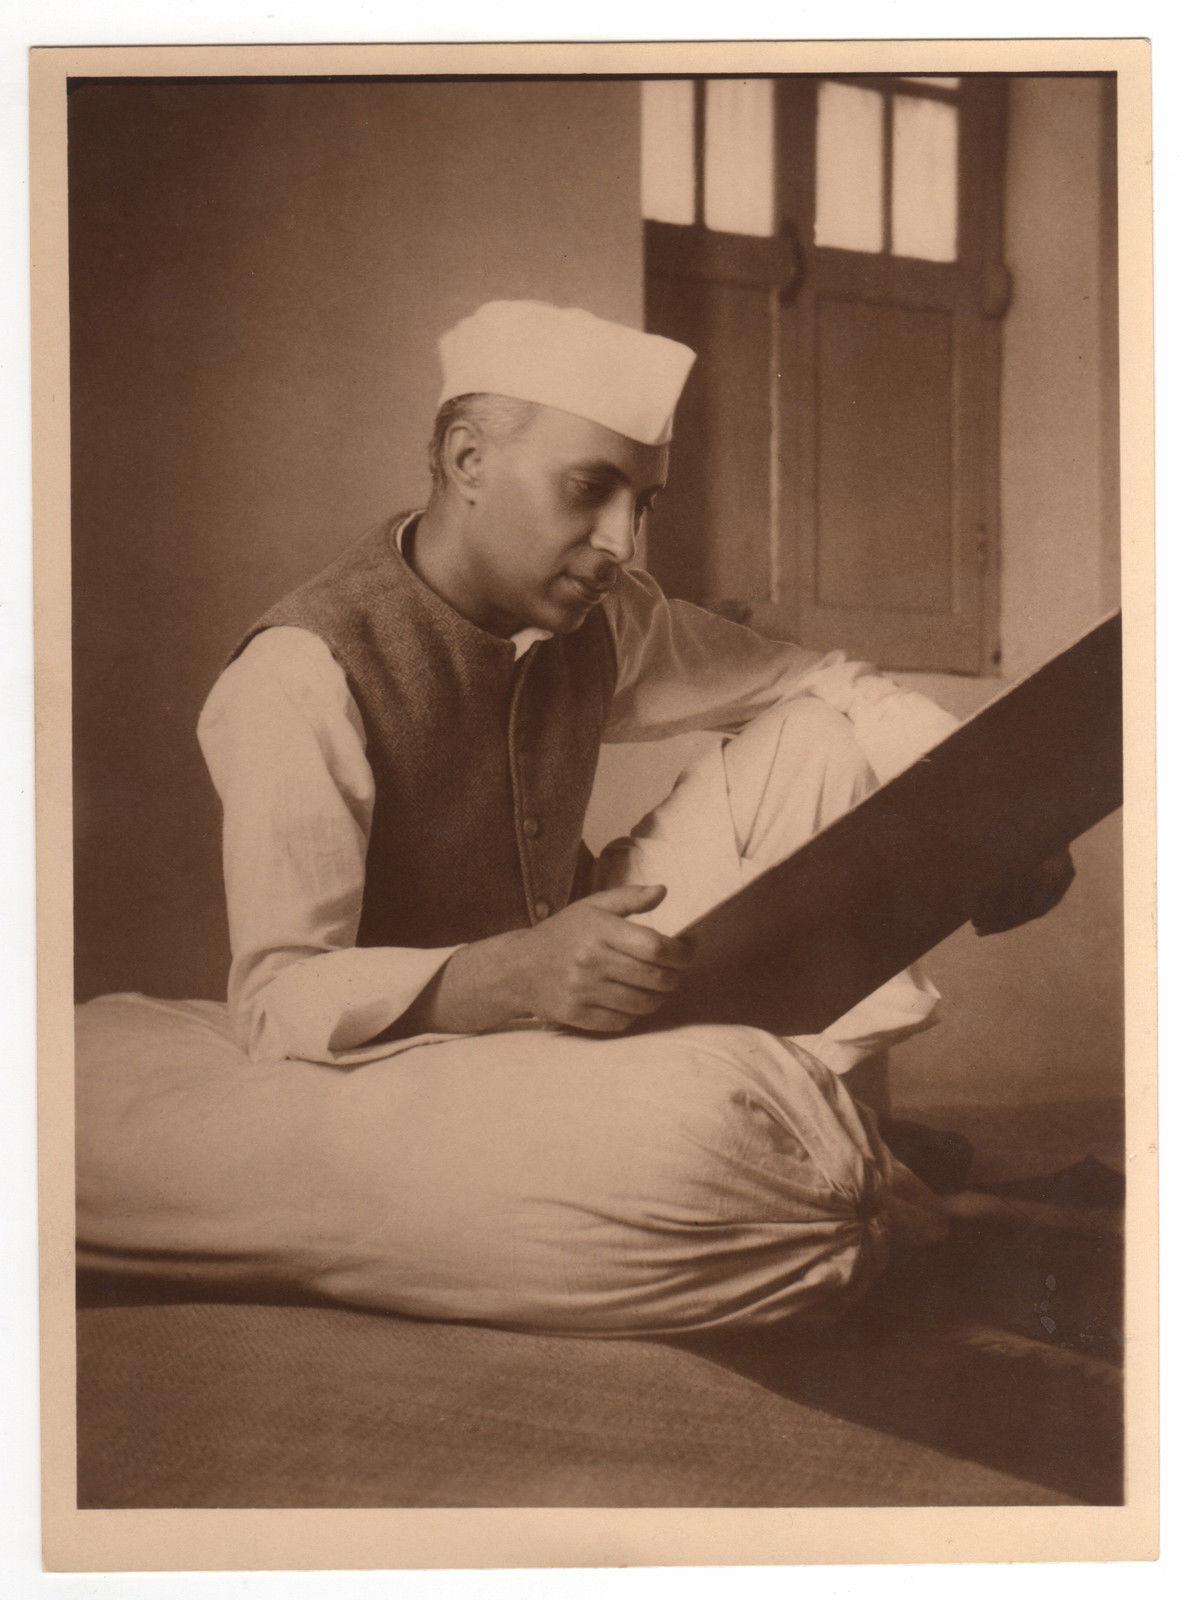 Jawaharlal Nehru in 1940's